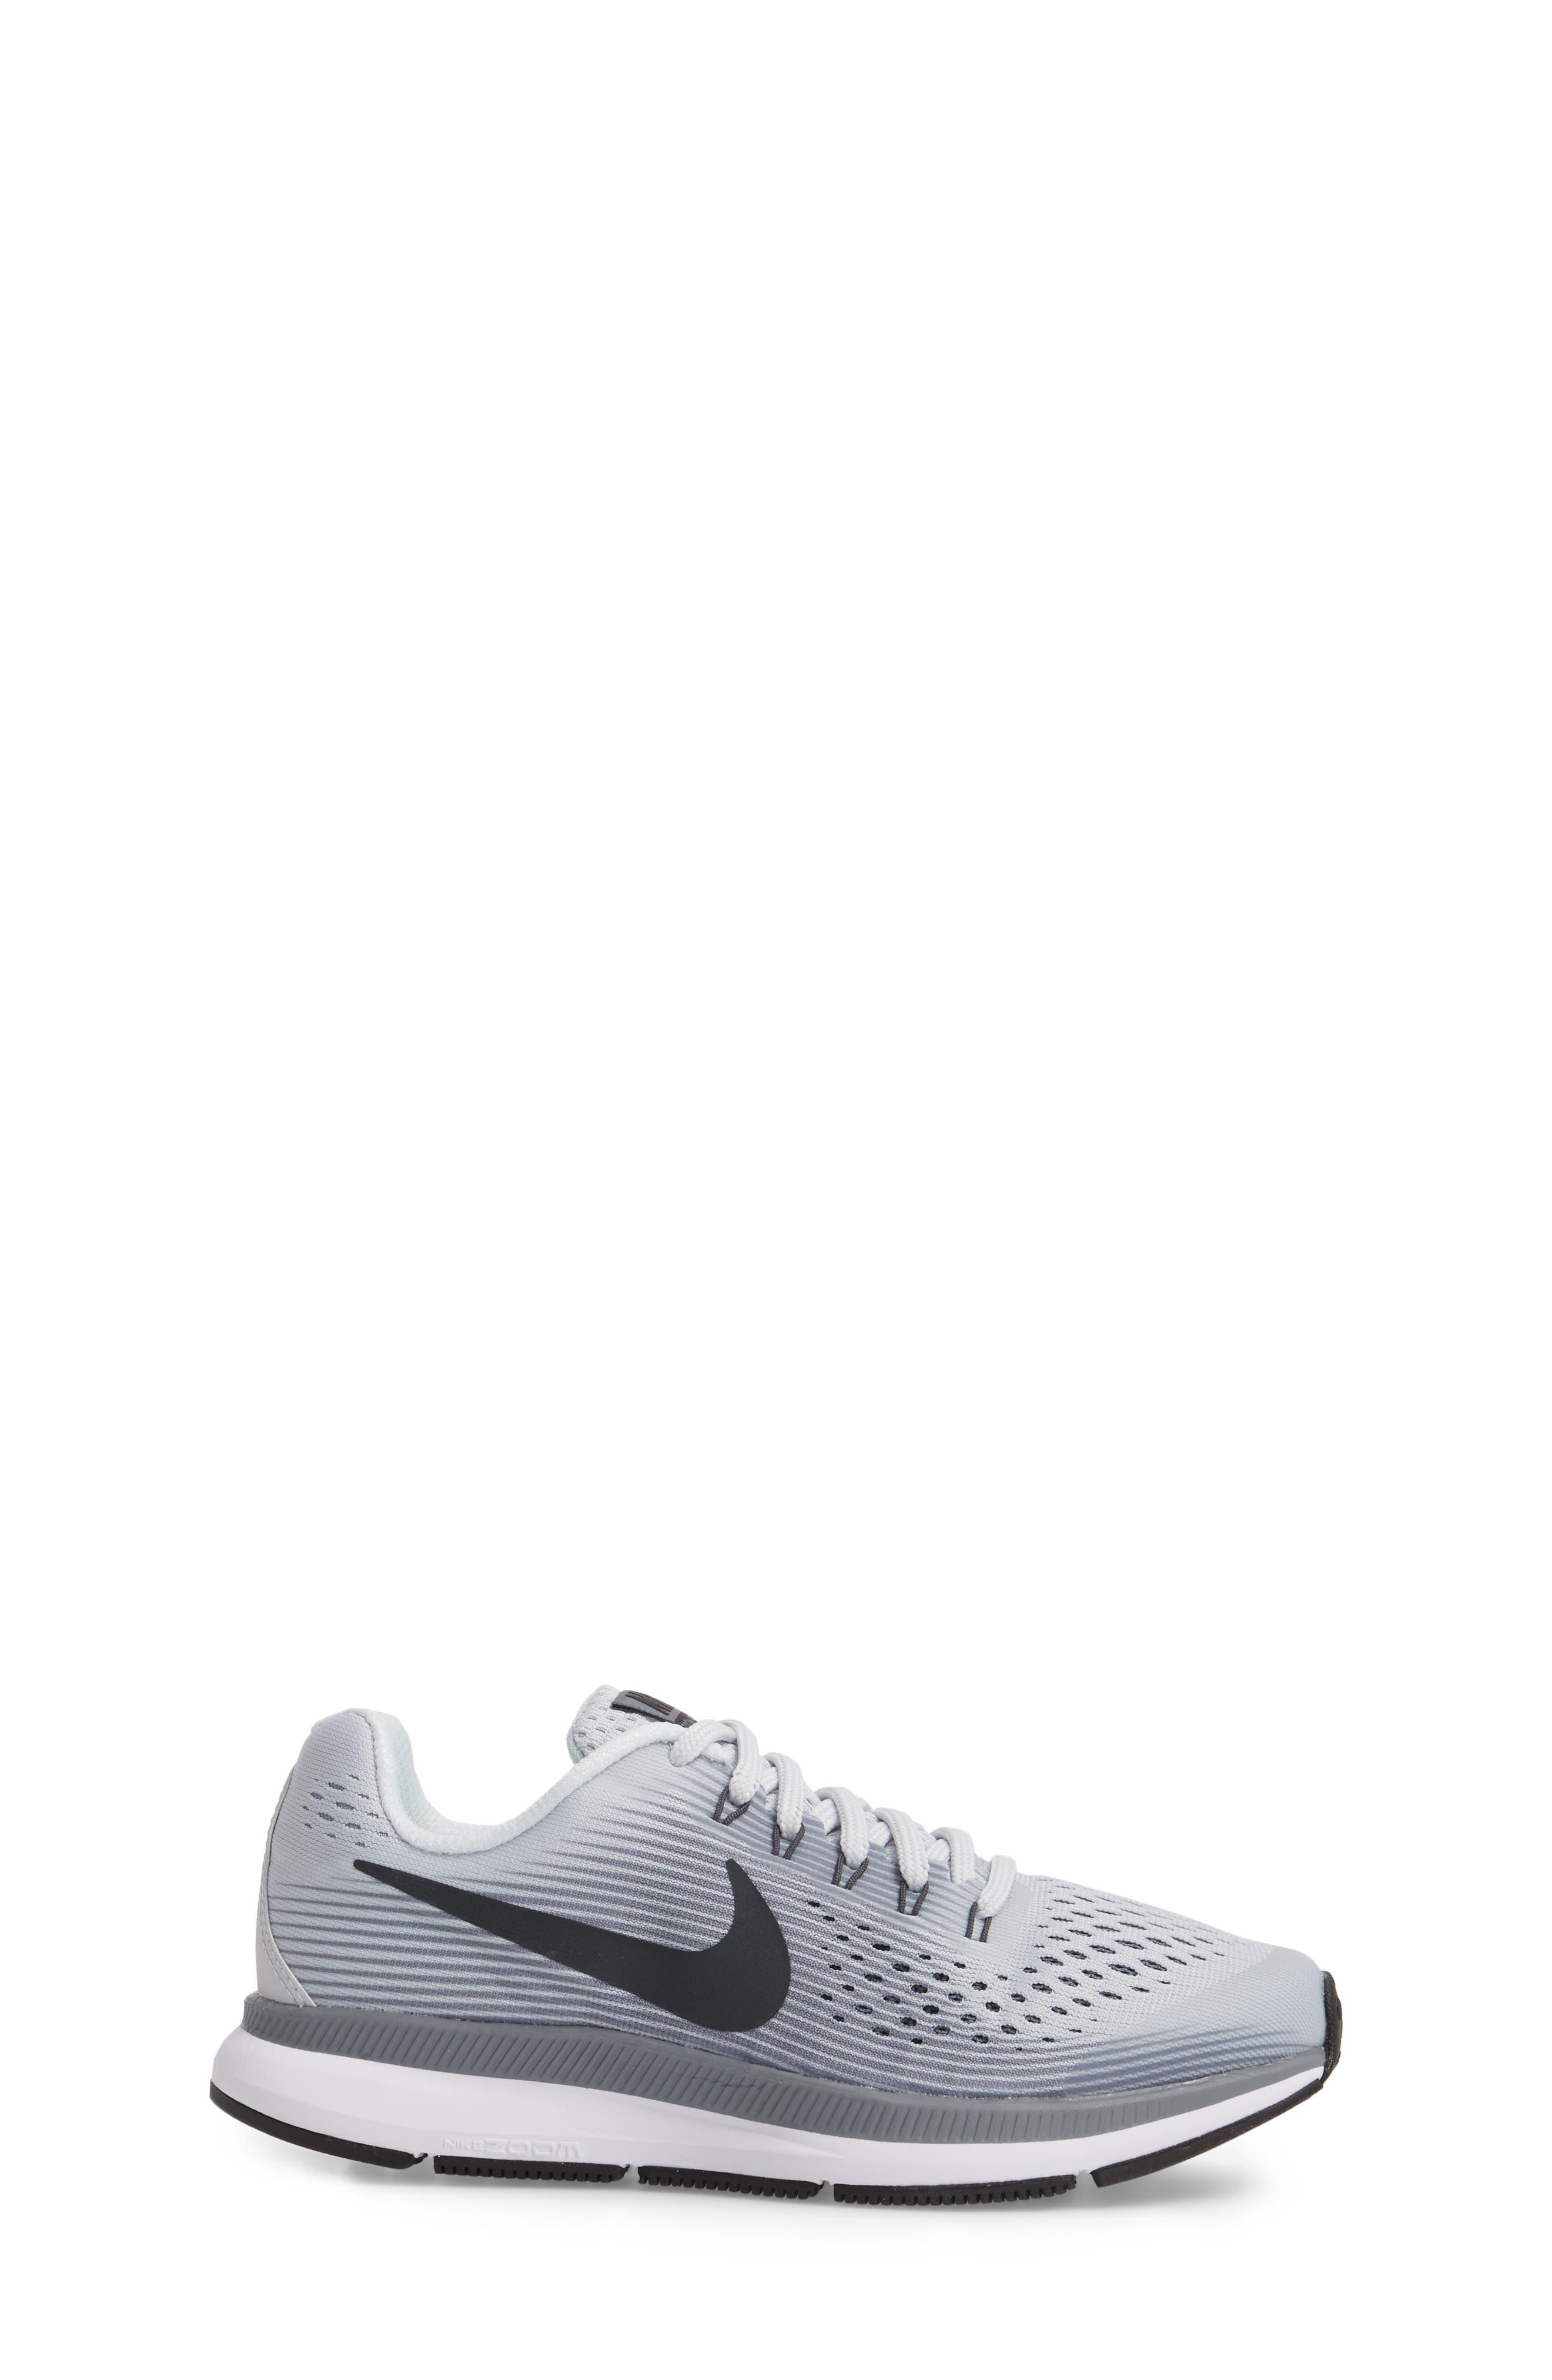 Zoom Pegasus 34 Sneaker,                             Alternate thumbnail 3, color,                             Platinum/ Anthracite/ Grey